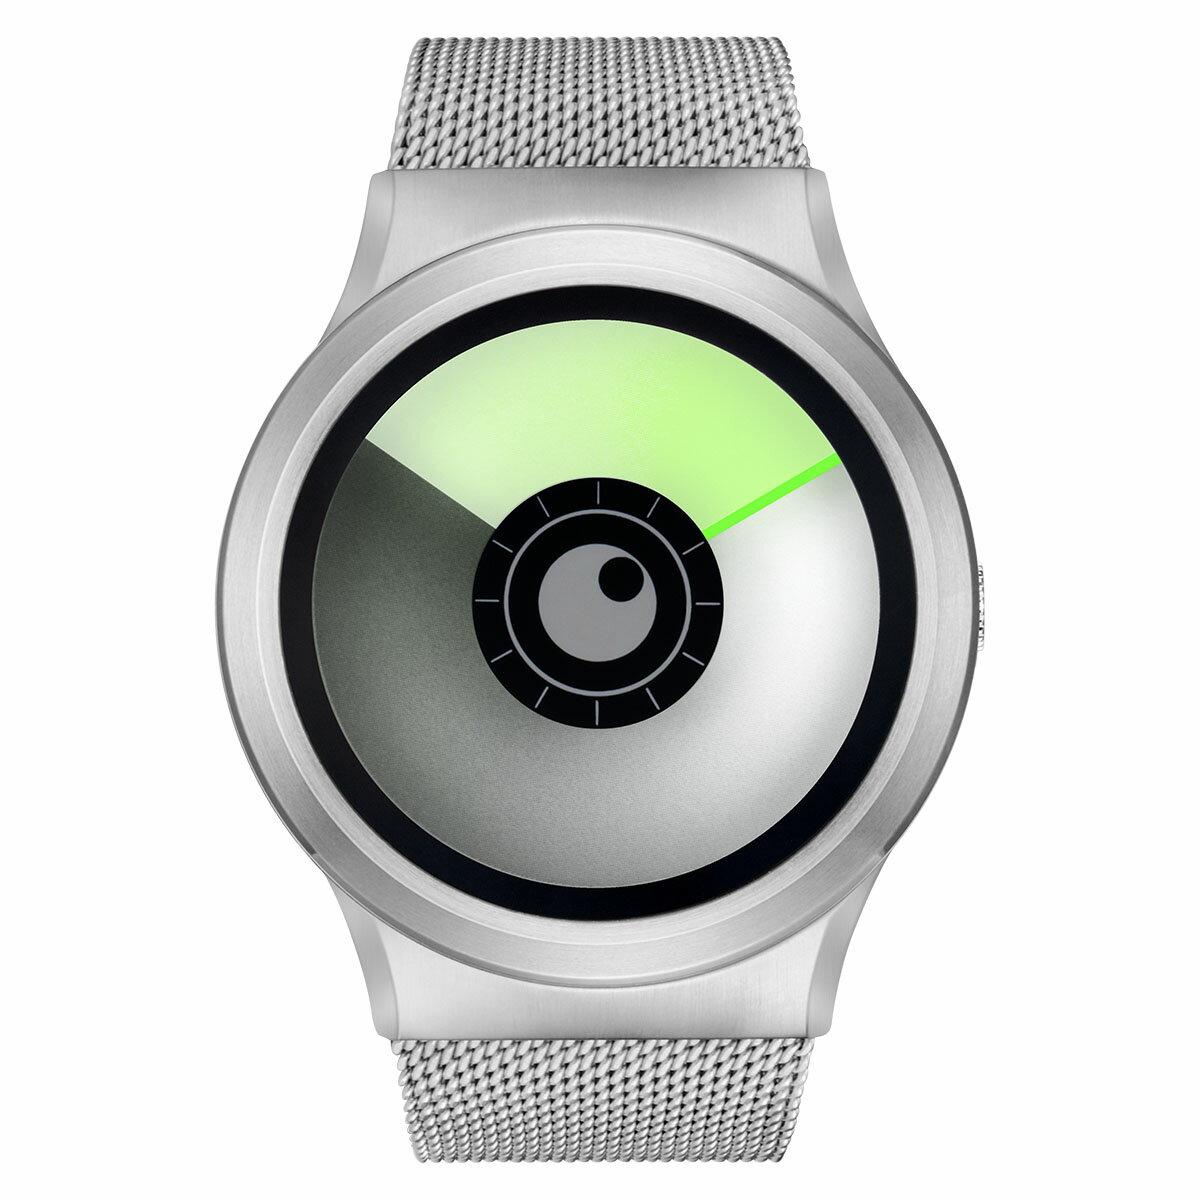 ZEROO AURORA BOREALIS ゼロ 電池式クォーツ 腕時計 [W12022B01SM01] グリーン デザインウォッチ ペア用 メンズ レディース ユニセックス おしゃれ時計 デザイナーズ